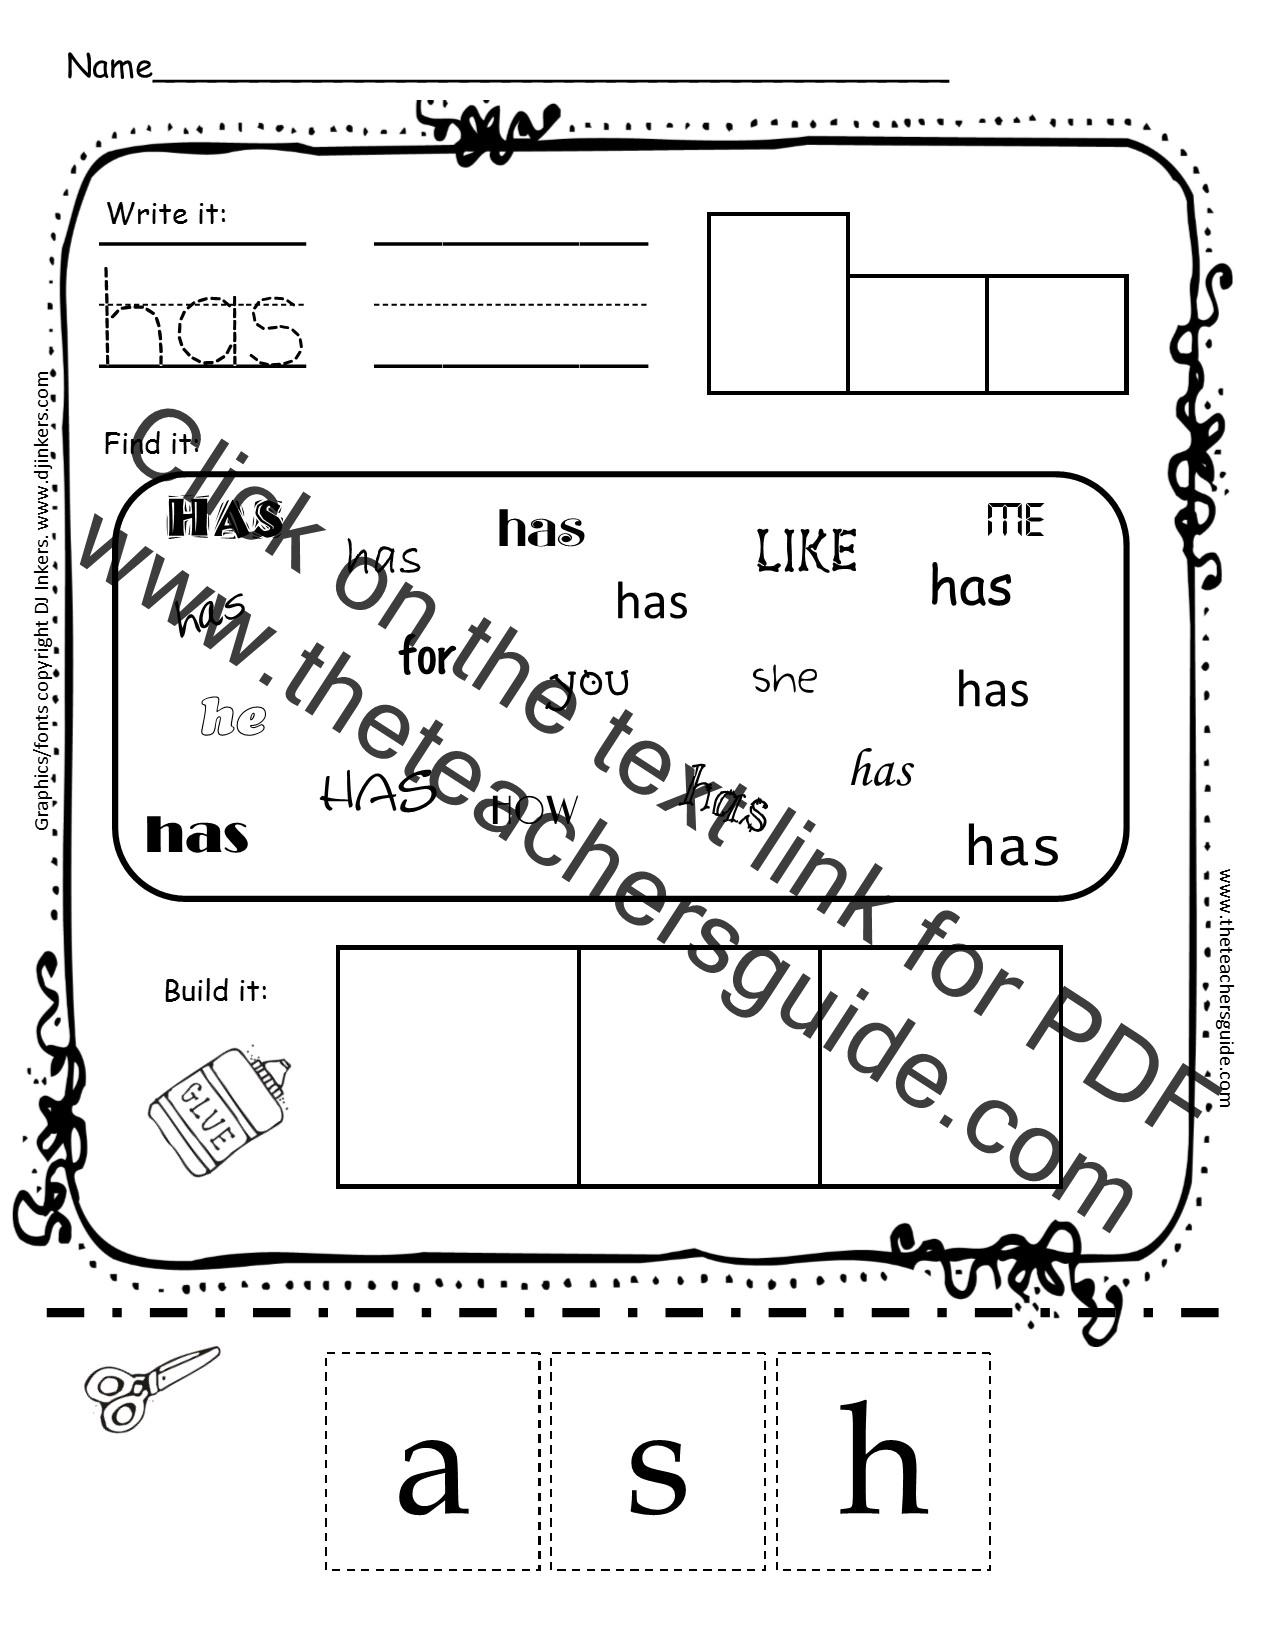 Kinder Garden: Kindergarten Sight Word Printouts From The Teacher's Guide